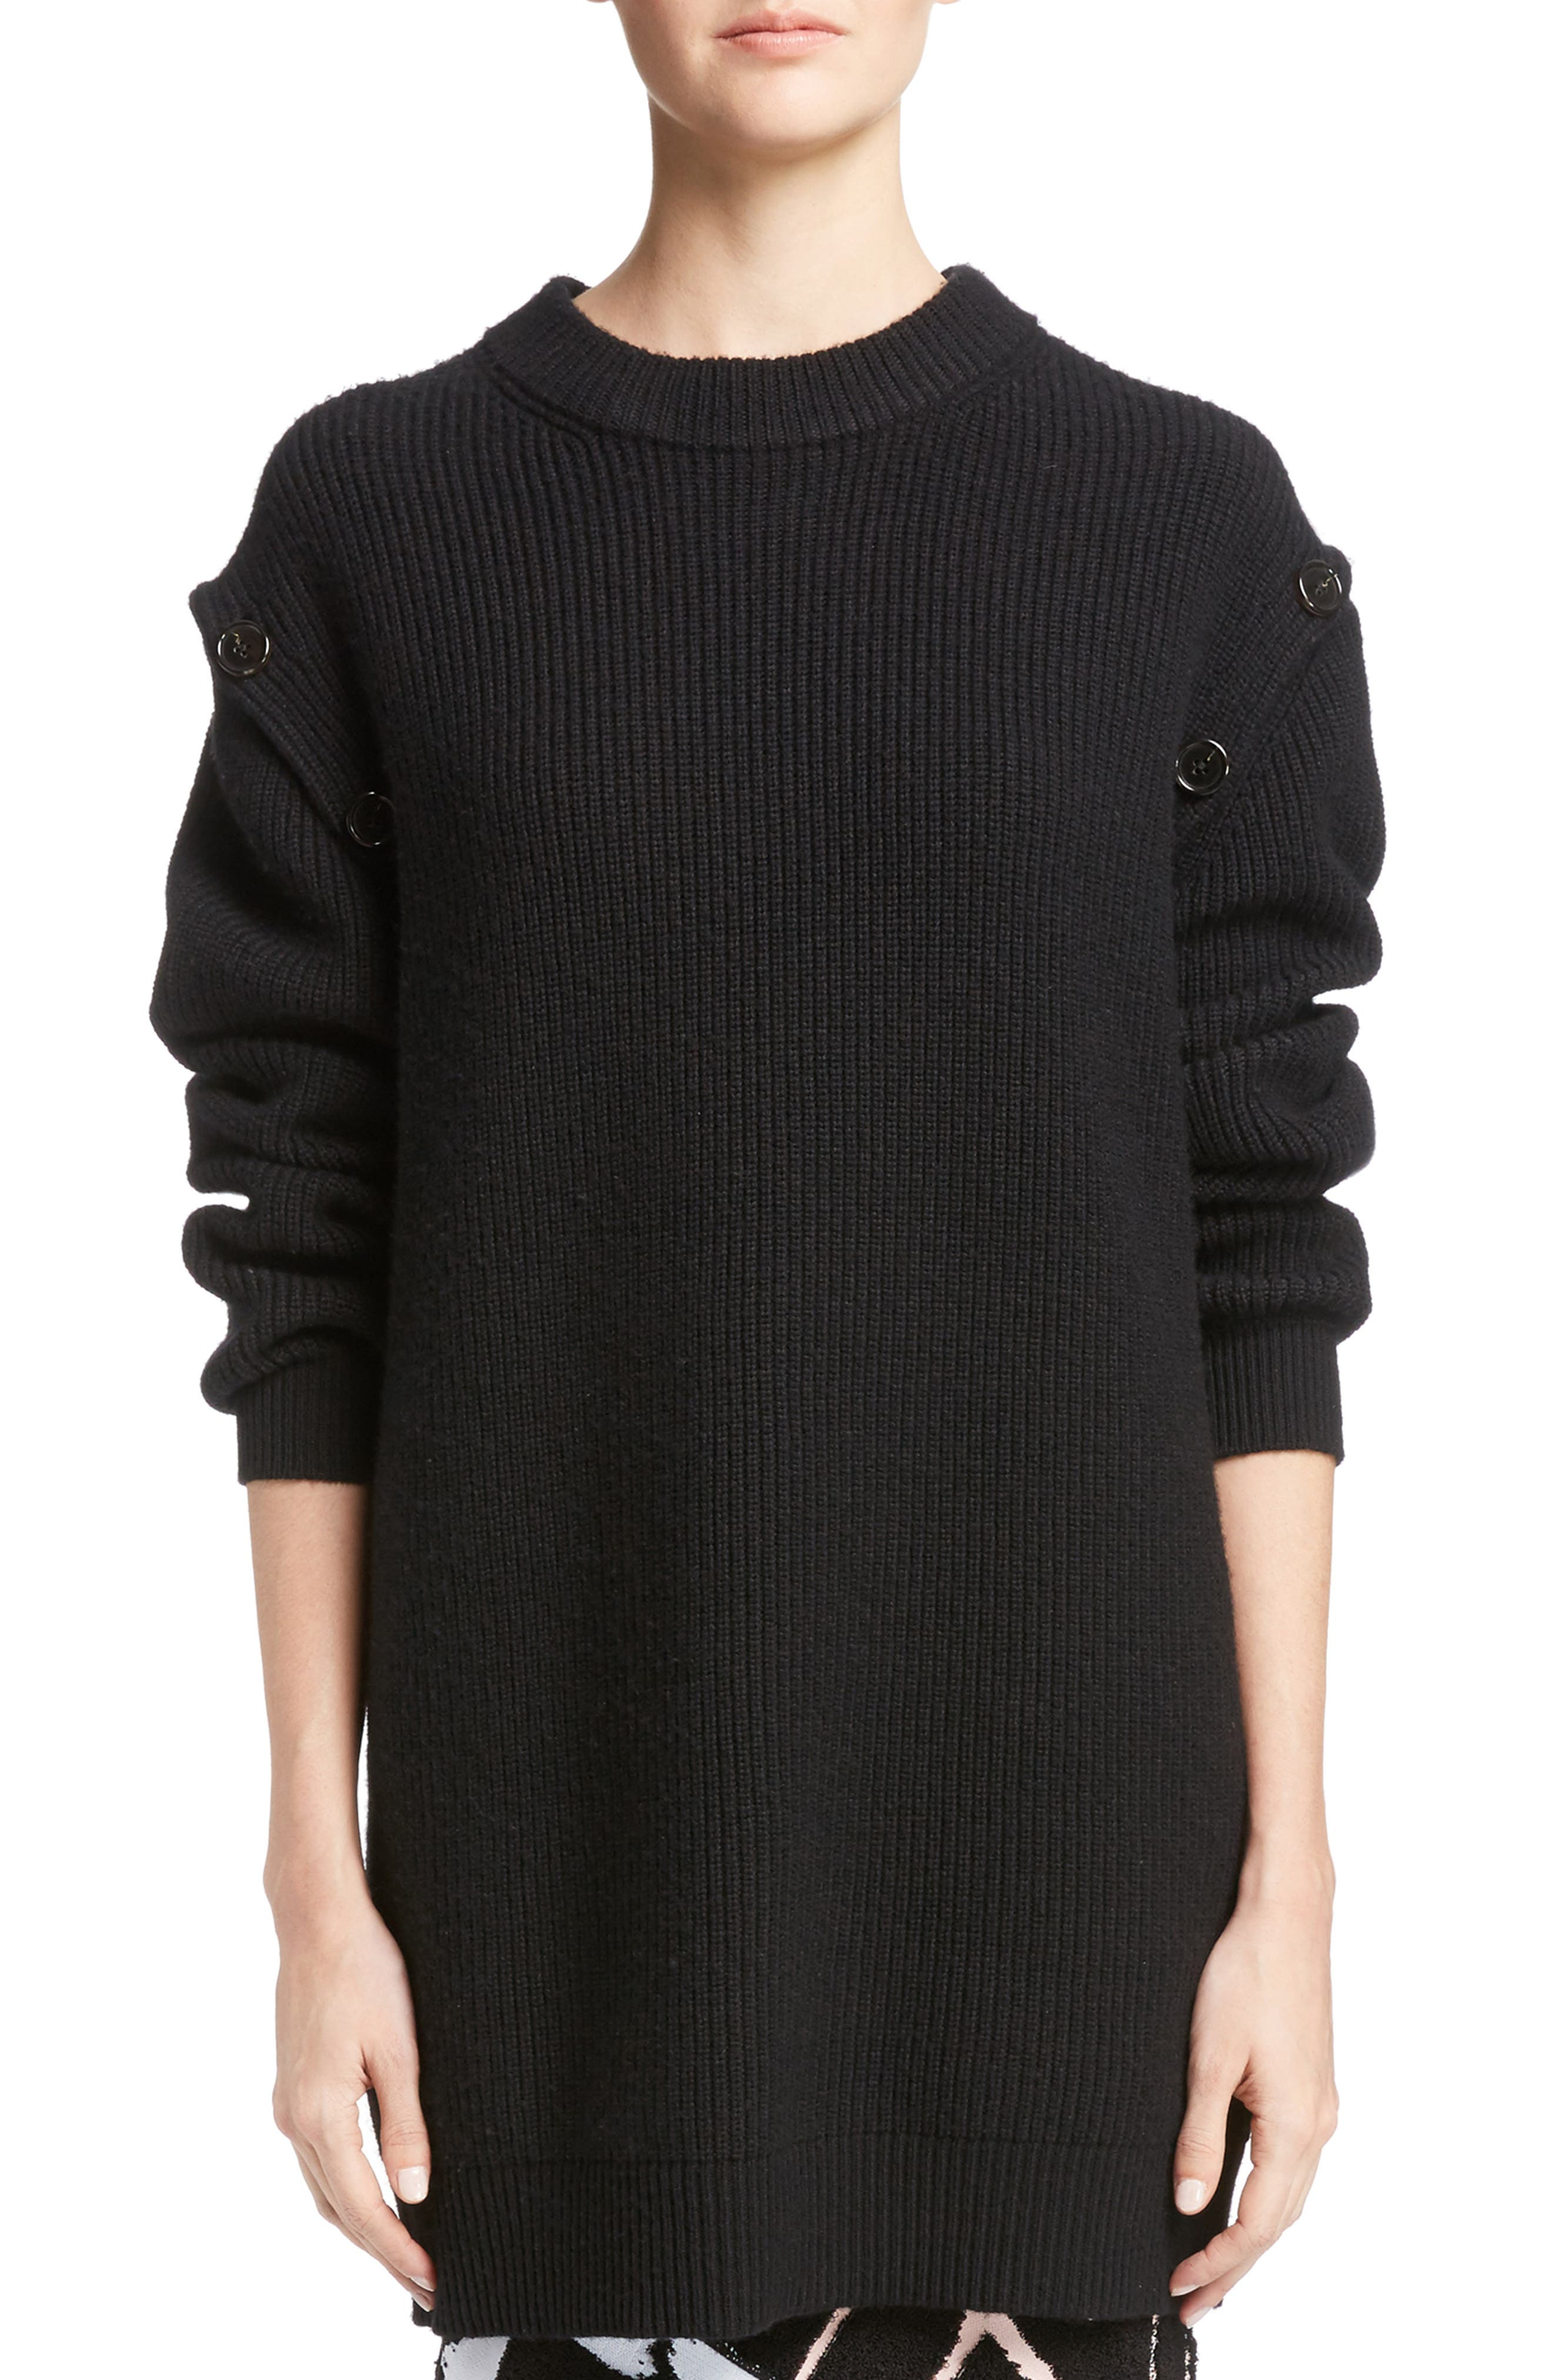 Proenza Schouler Wool & Cashmere Blend Knit Tunic